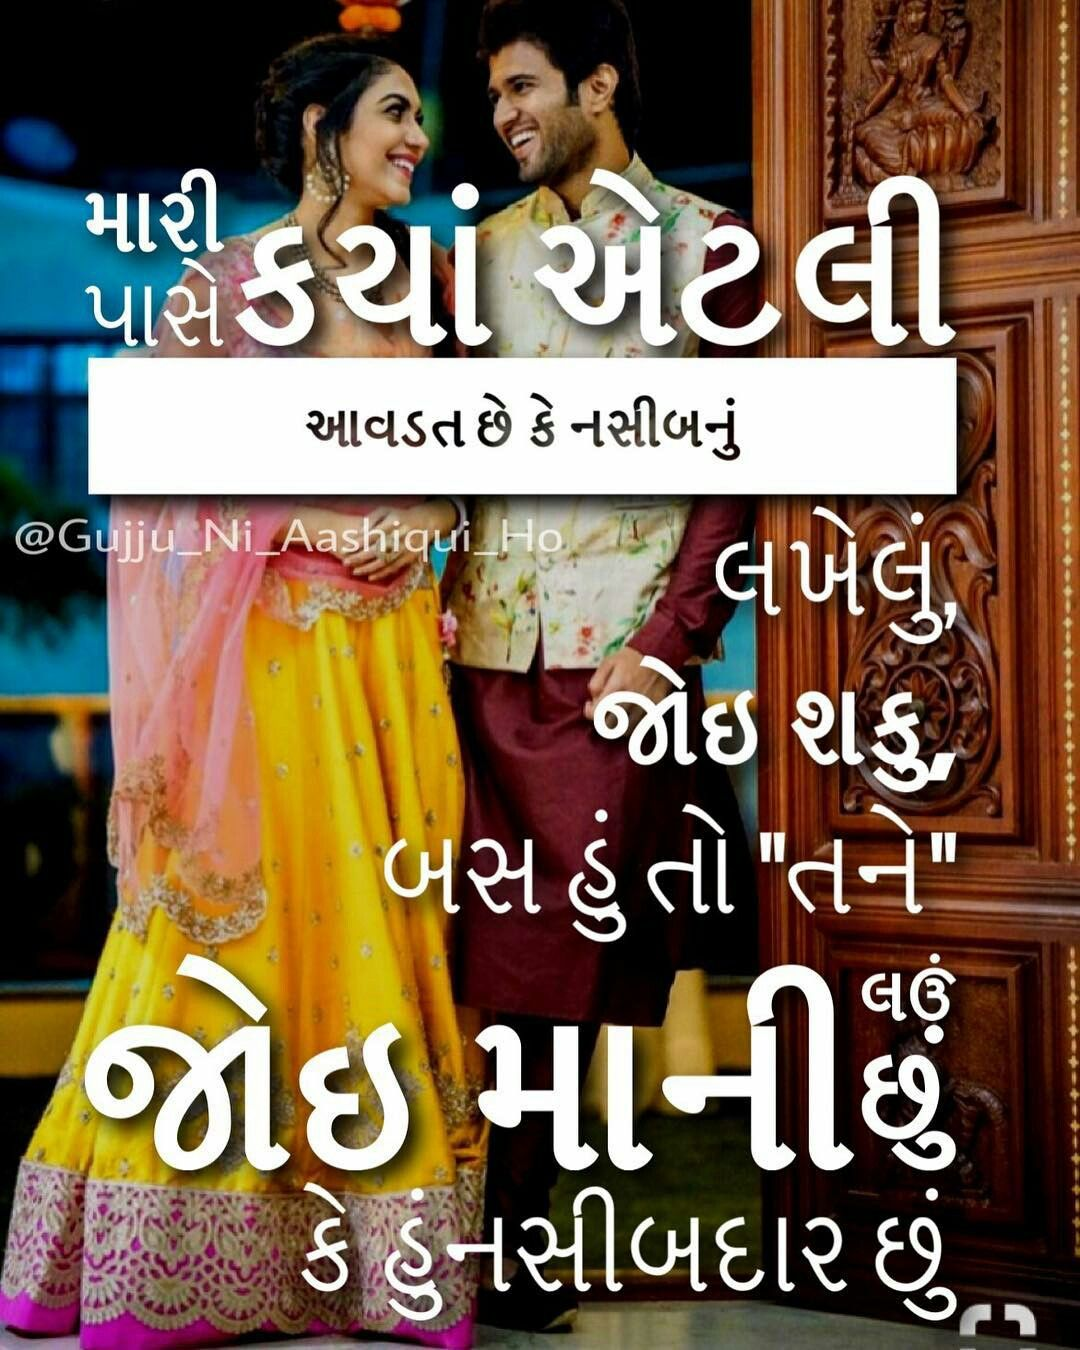 Sad Love Quotes In Gujarati: Pin By Shilpa Chavda On Gujrati